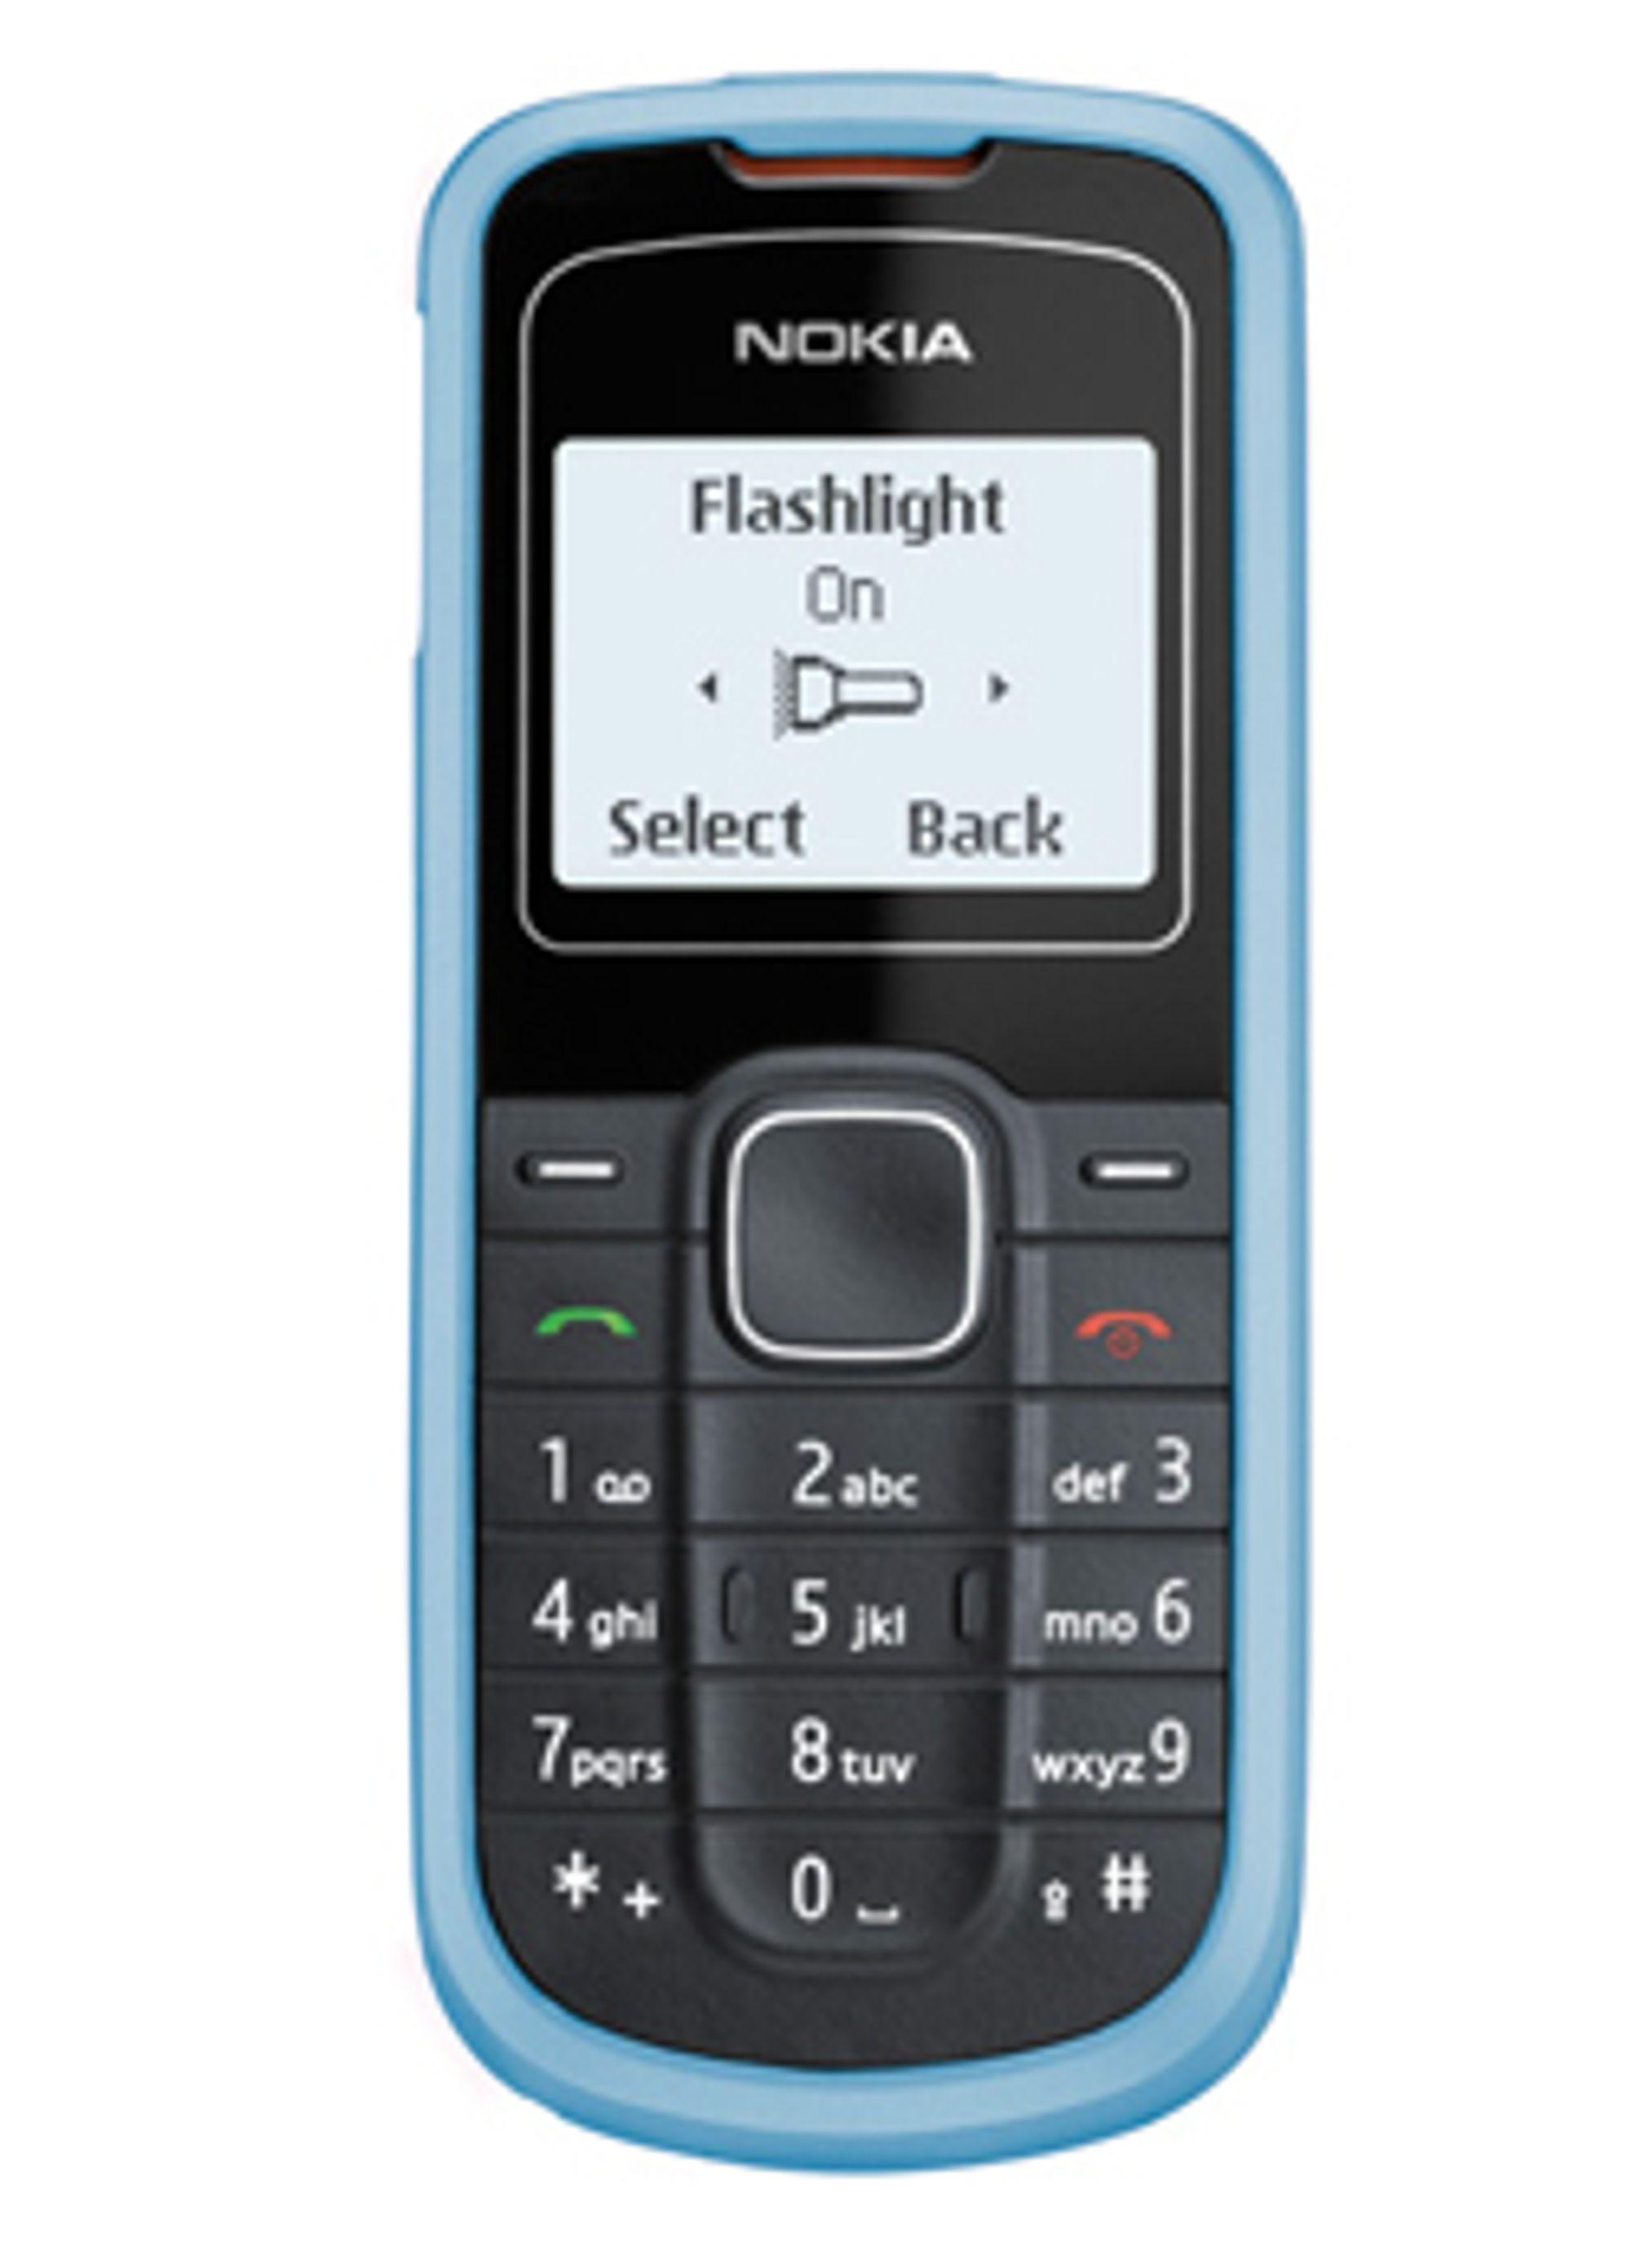 1202 er Nokias billigste mobil noen gang.